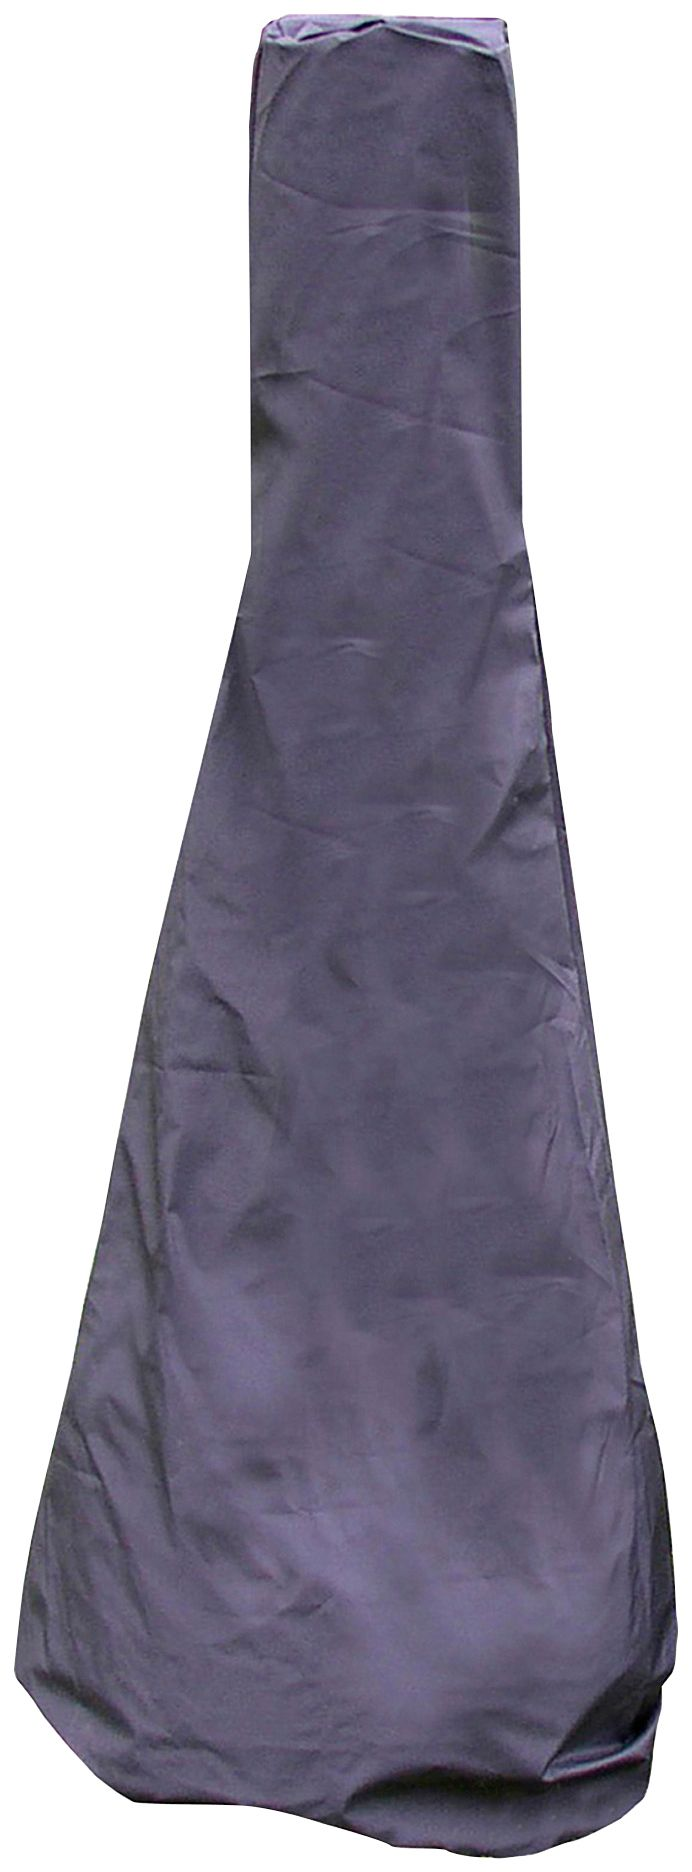 BUSCHBECK  Abdeckhaube »Colorado S/M«, B/T/H: 45/45/125 cm